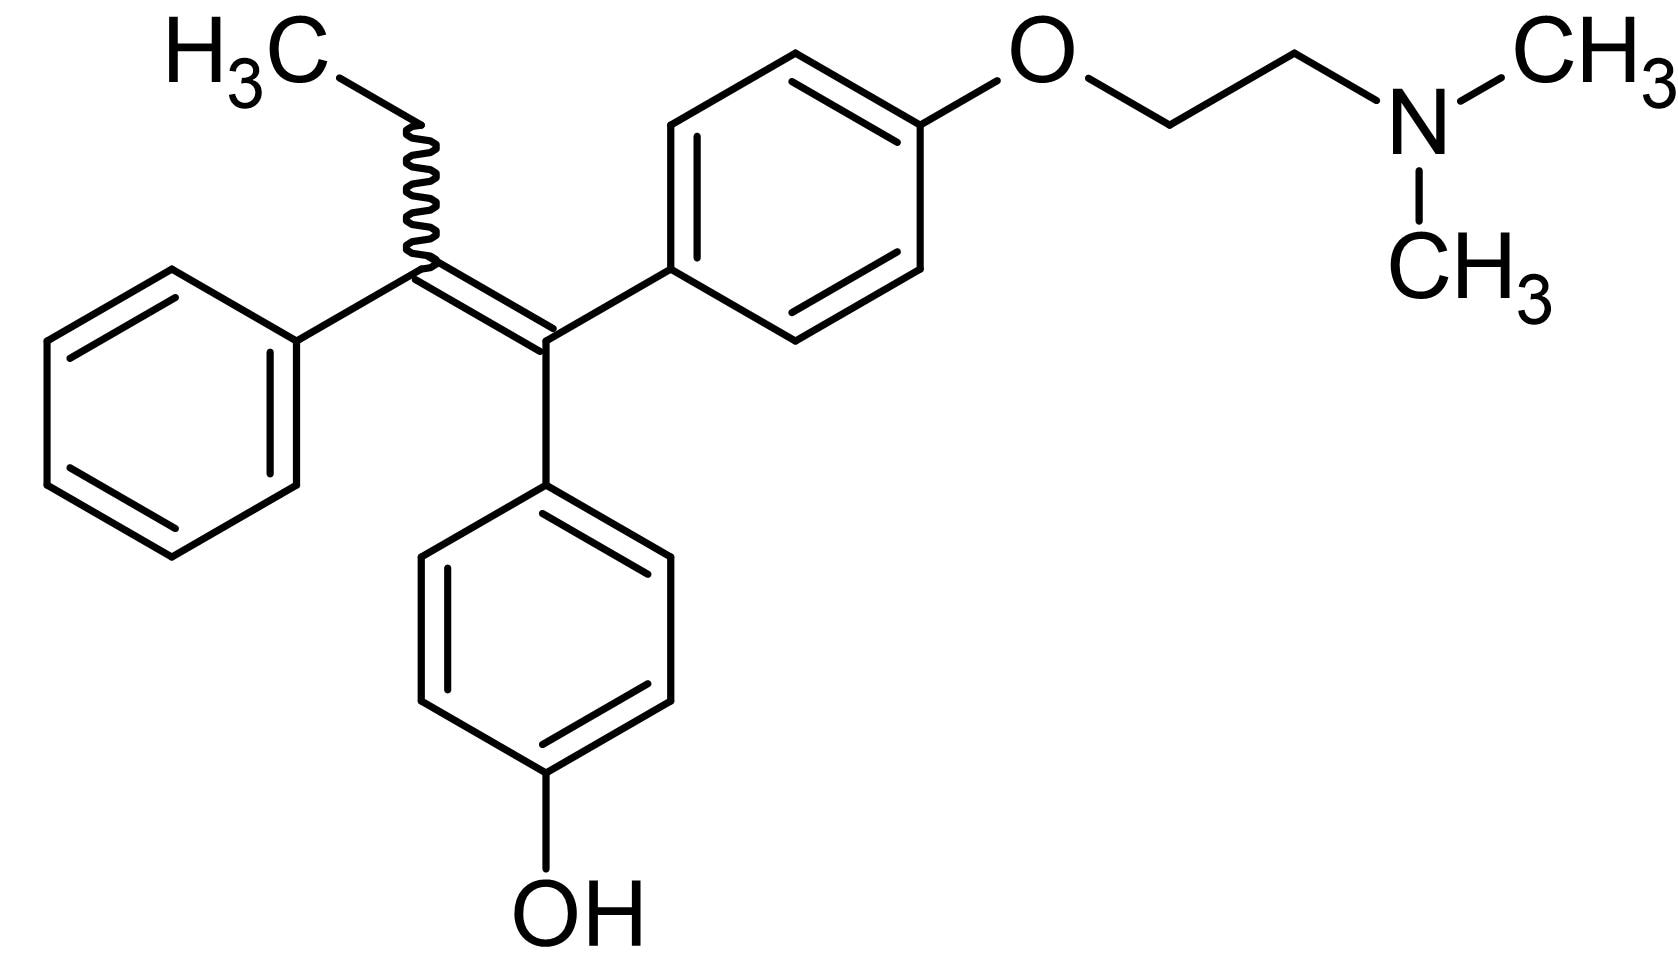 Chemical Structure - (E,Z)-4-Hydroxytamoxifen (17197F0KYM), estrogen receptor modulator (ab143638)